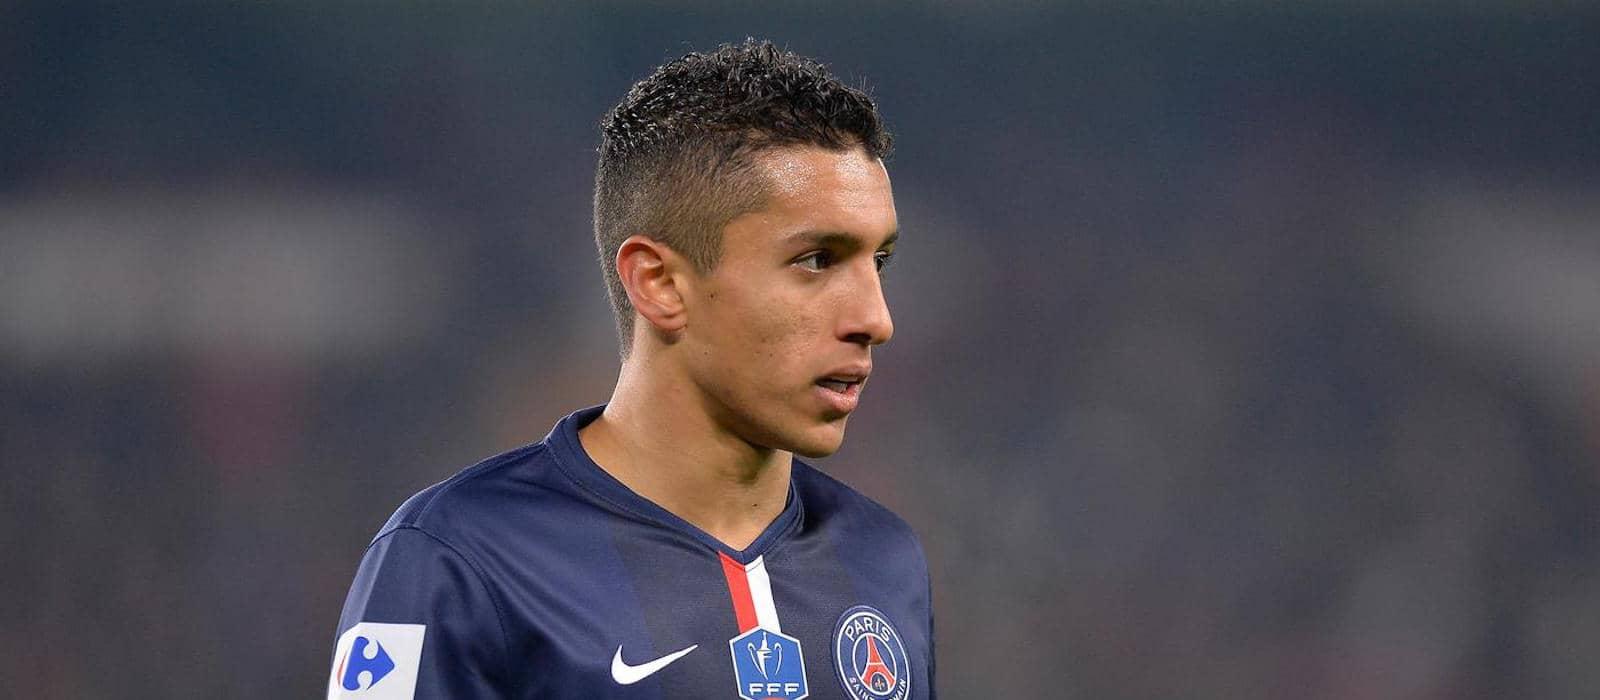 Manchester United launch €70m bid for Paris Saint Germain's Marquinhos – report